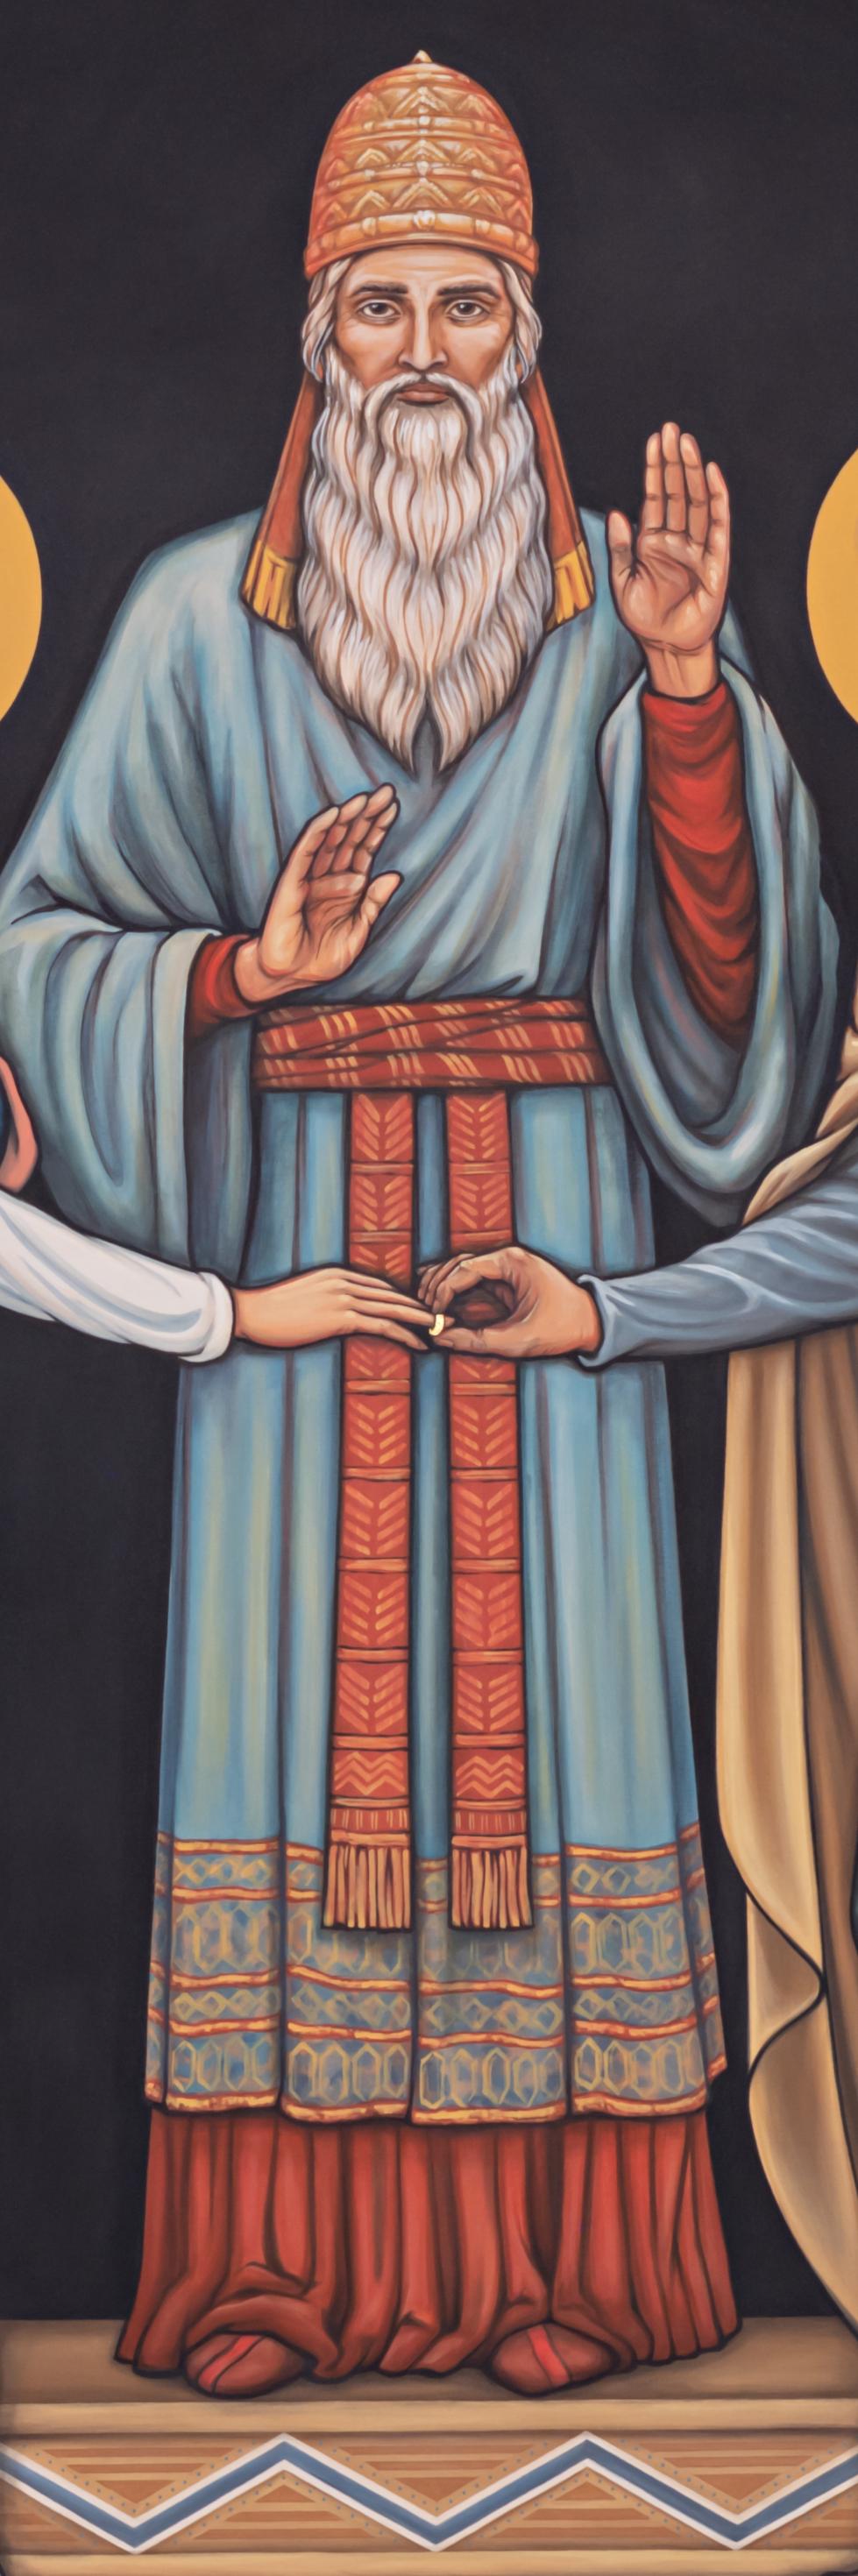 Betrothal High Priest.png